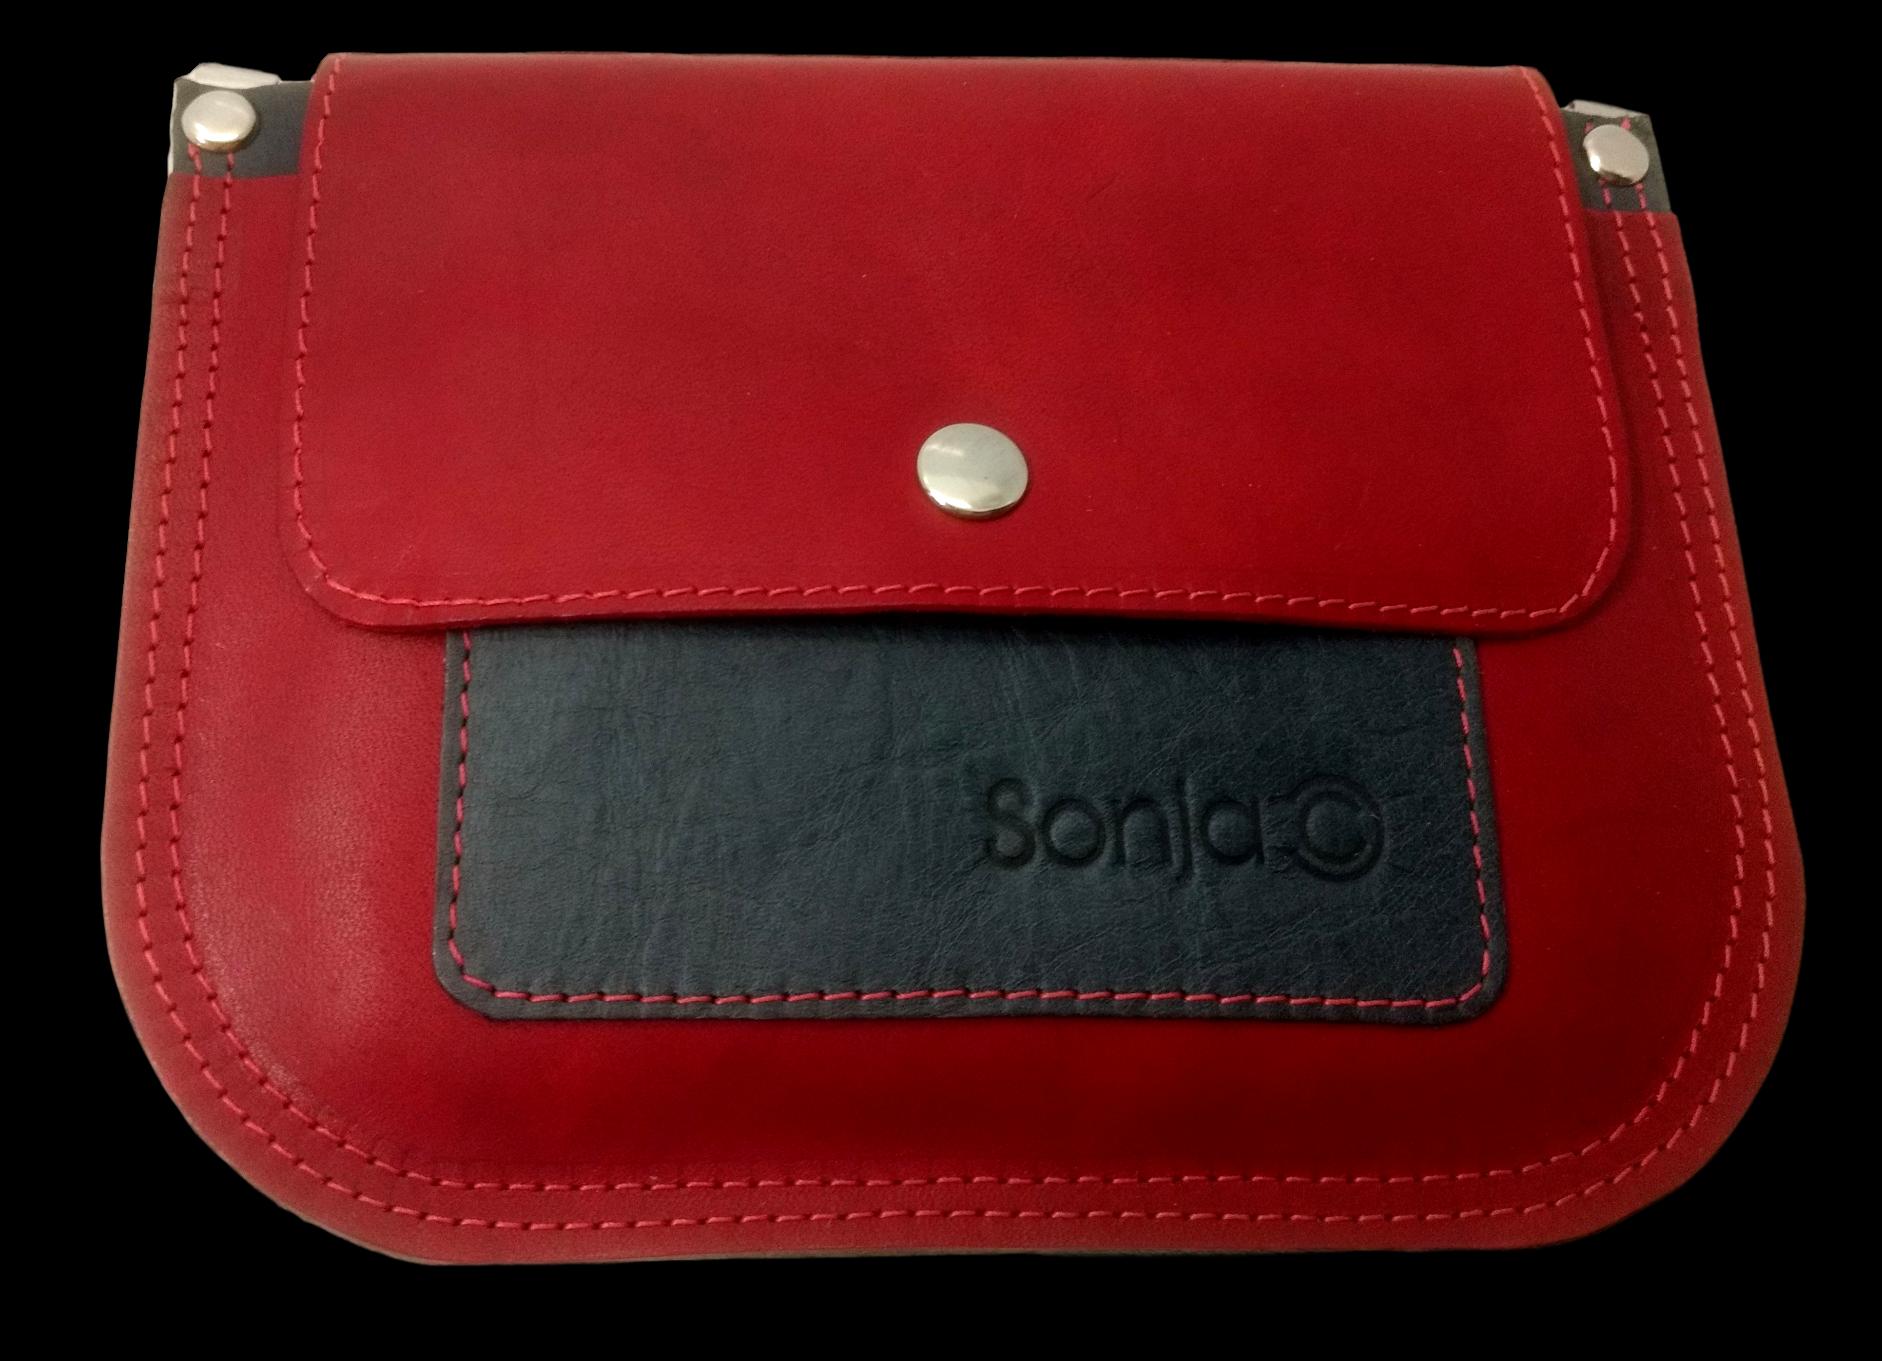 Red & Charcoal Leather Pocket Bag